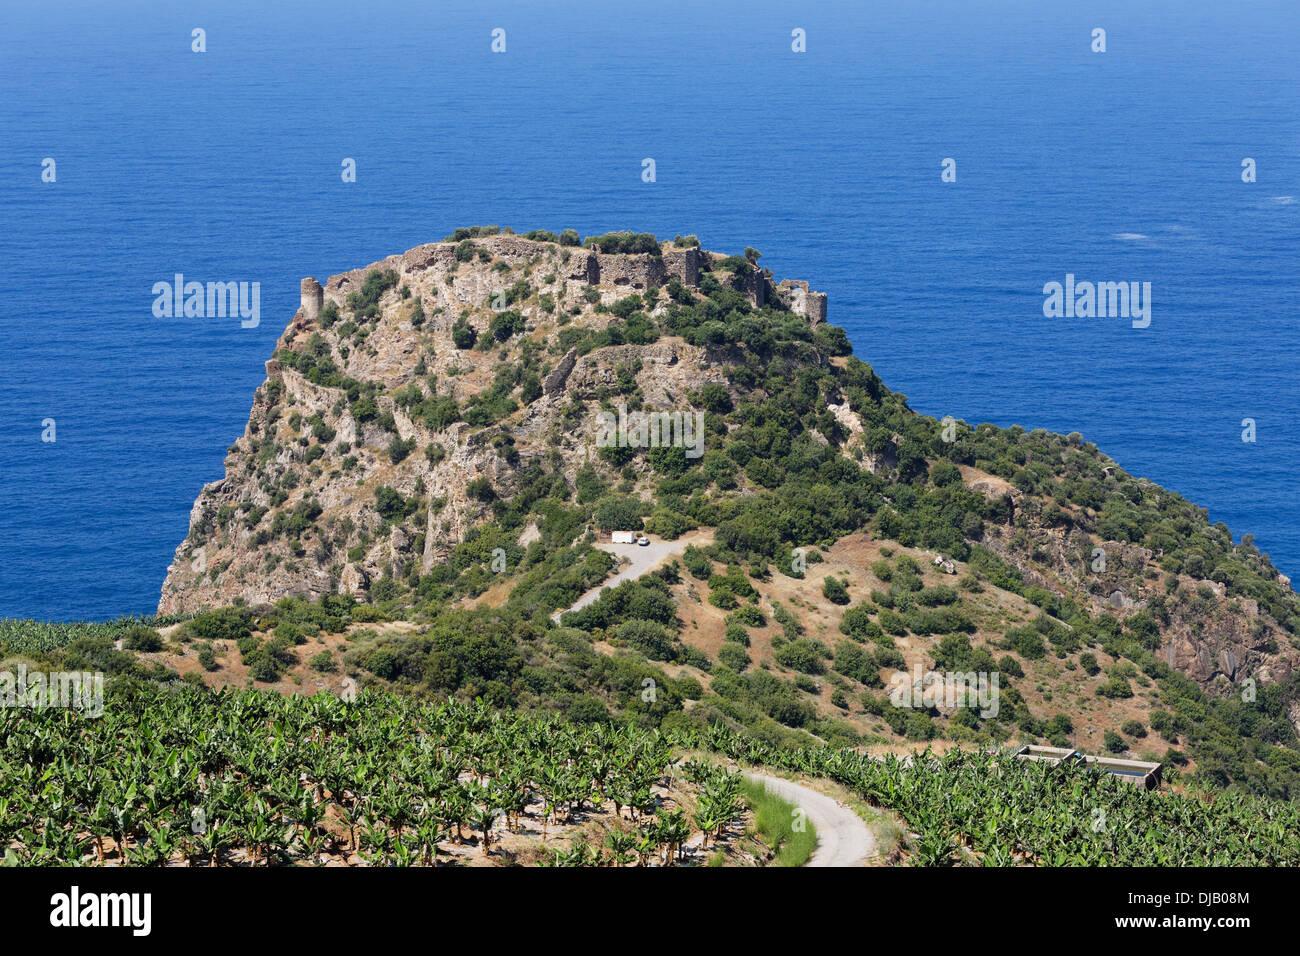 Antica città di Antiochia ad Cragum, Gazipasa, provincia di Antalya, Riviera Turca, Turchia Immagini Stock